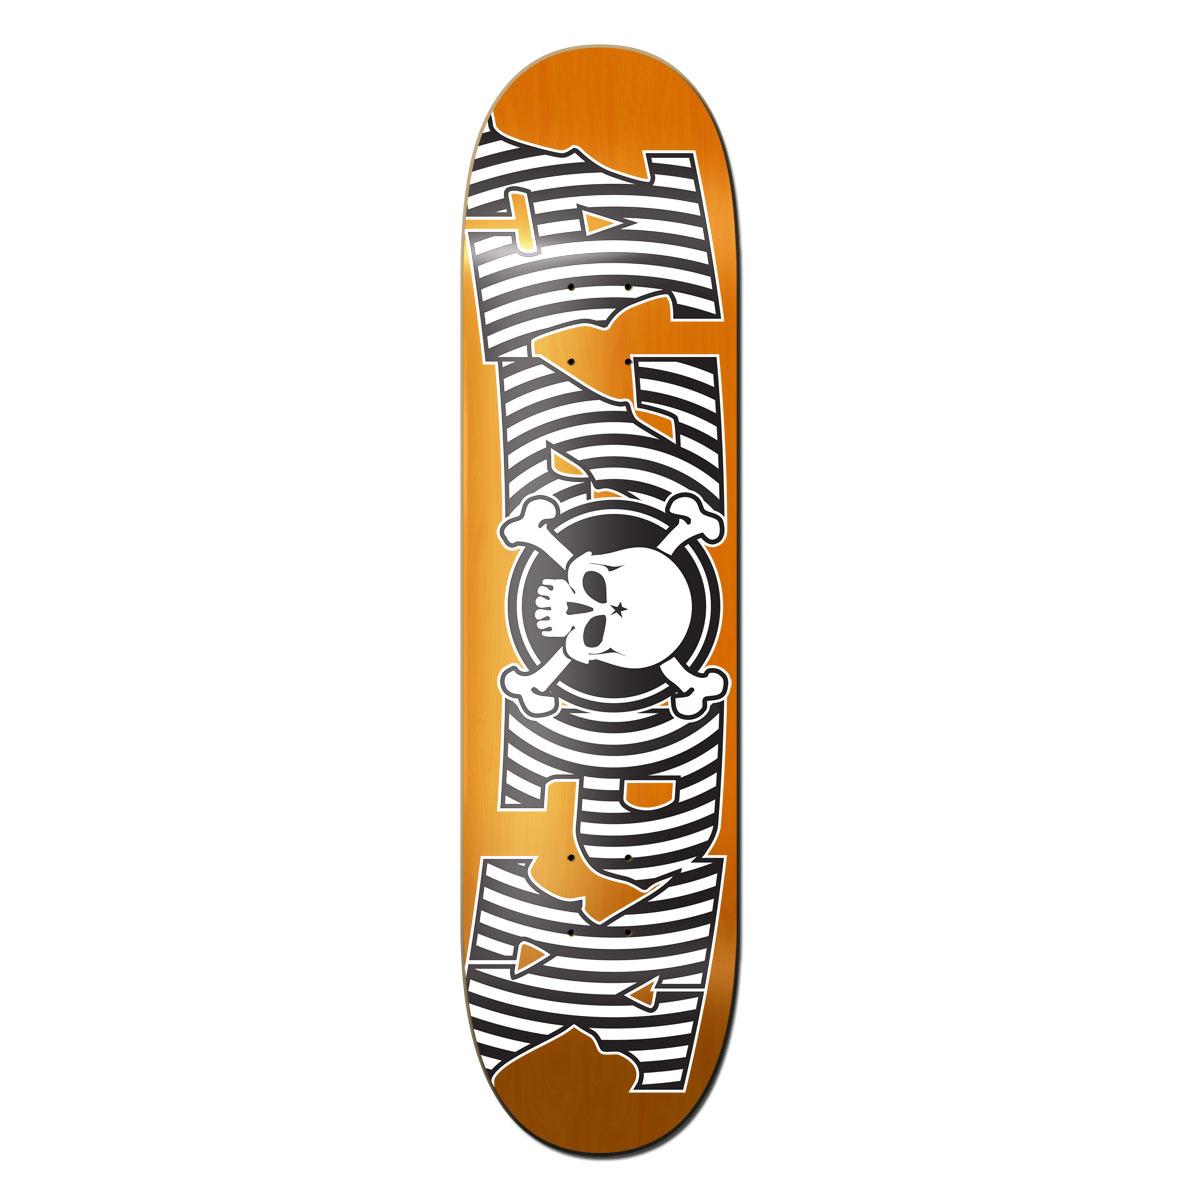 8.25″ AZPX Popsicle Deck